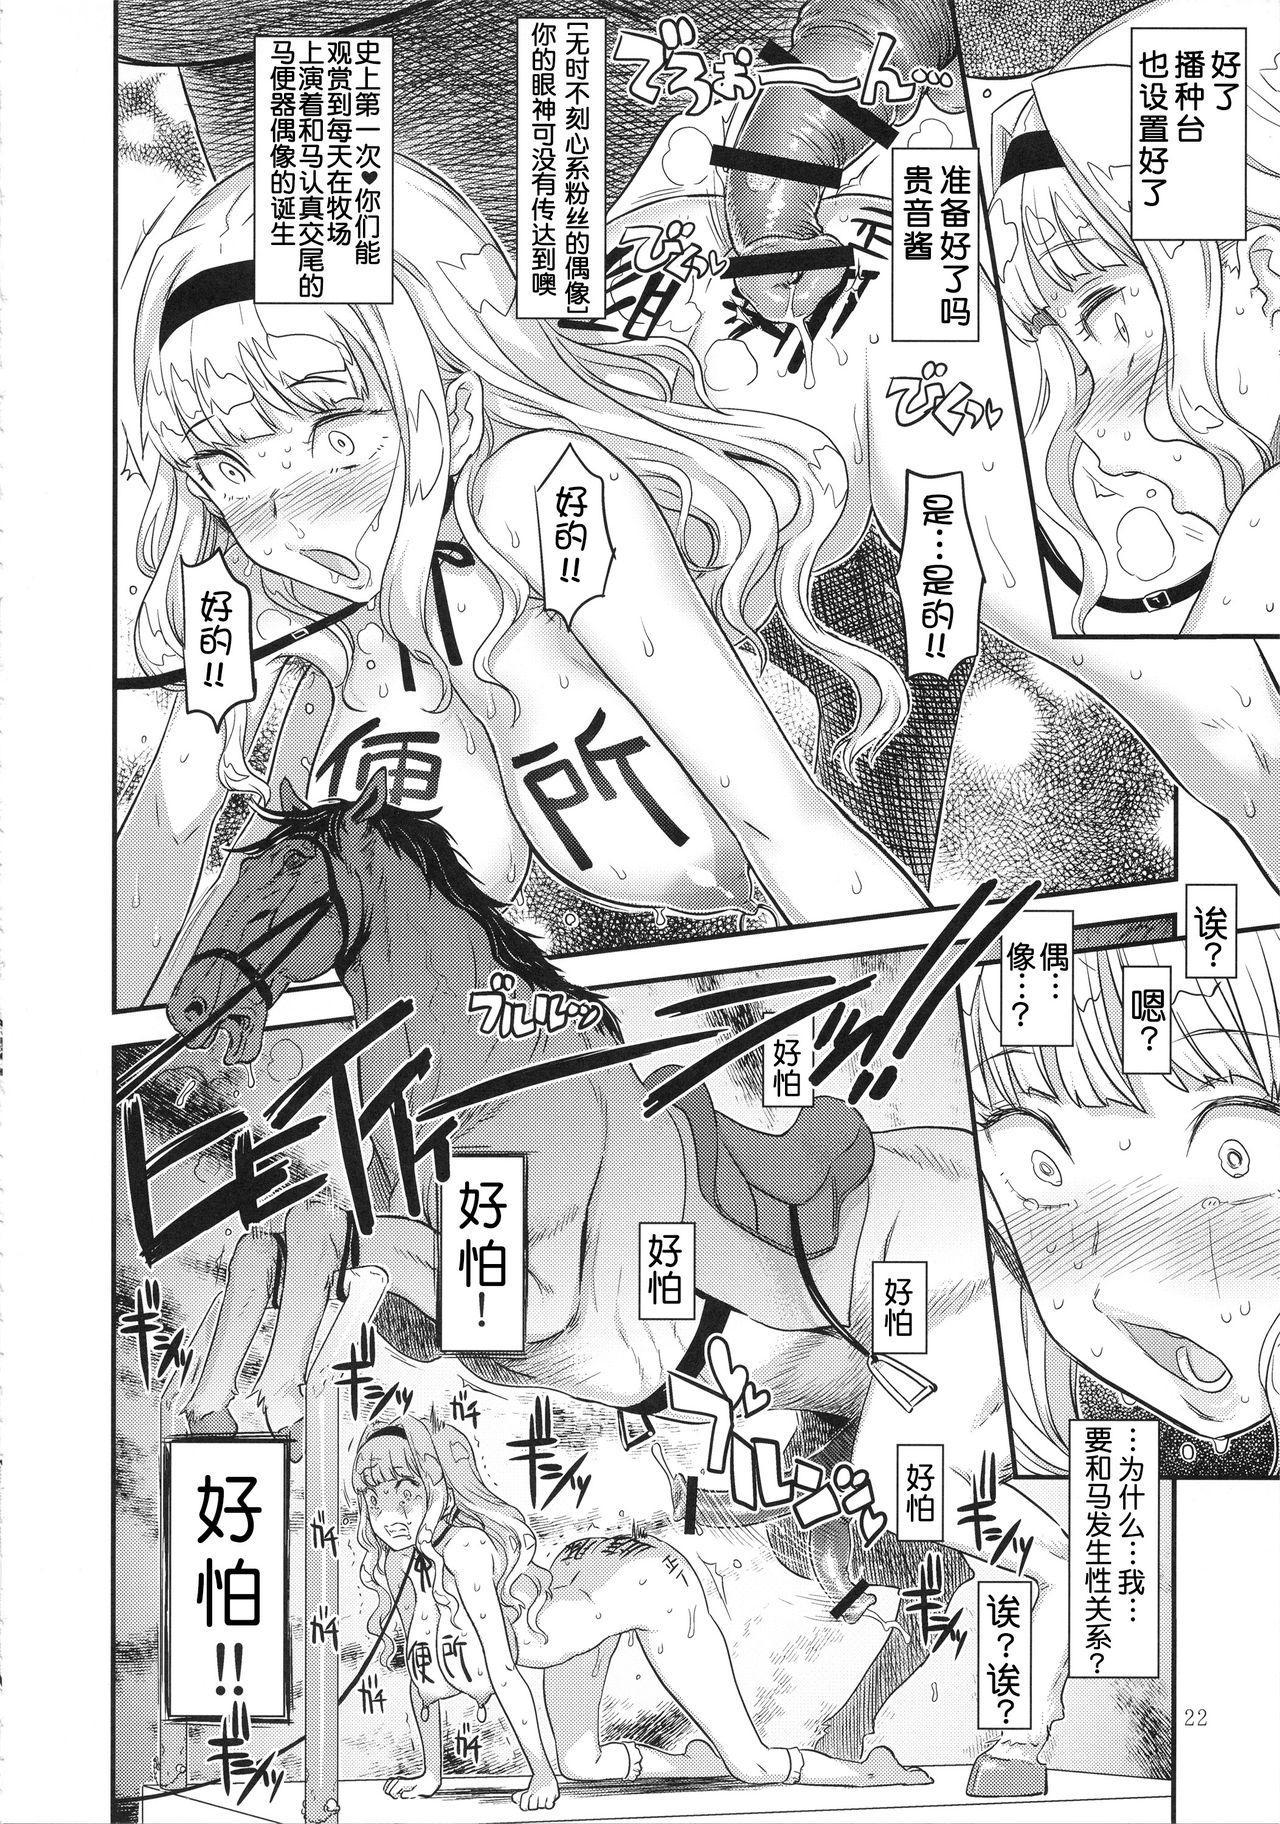 Koukai Tanetsuke Hentai Koubi 2 20